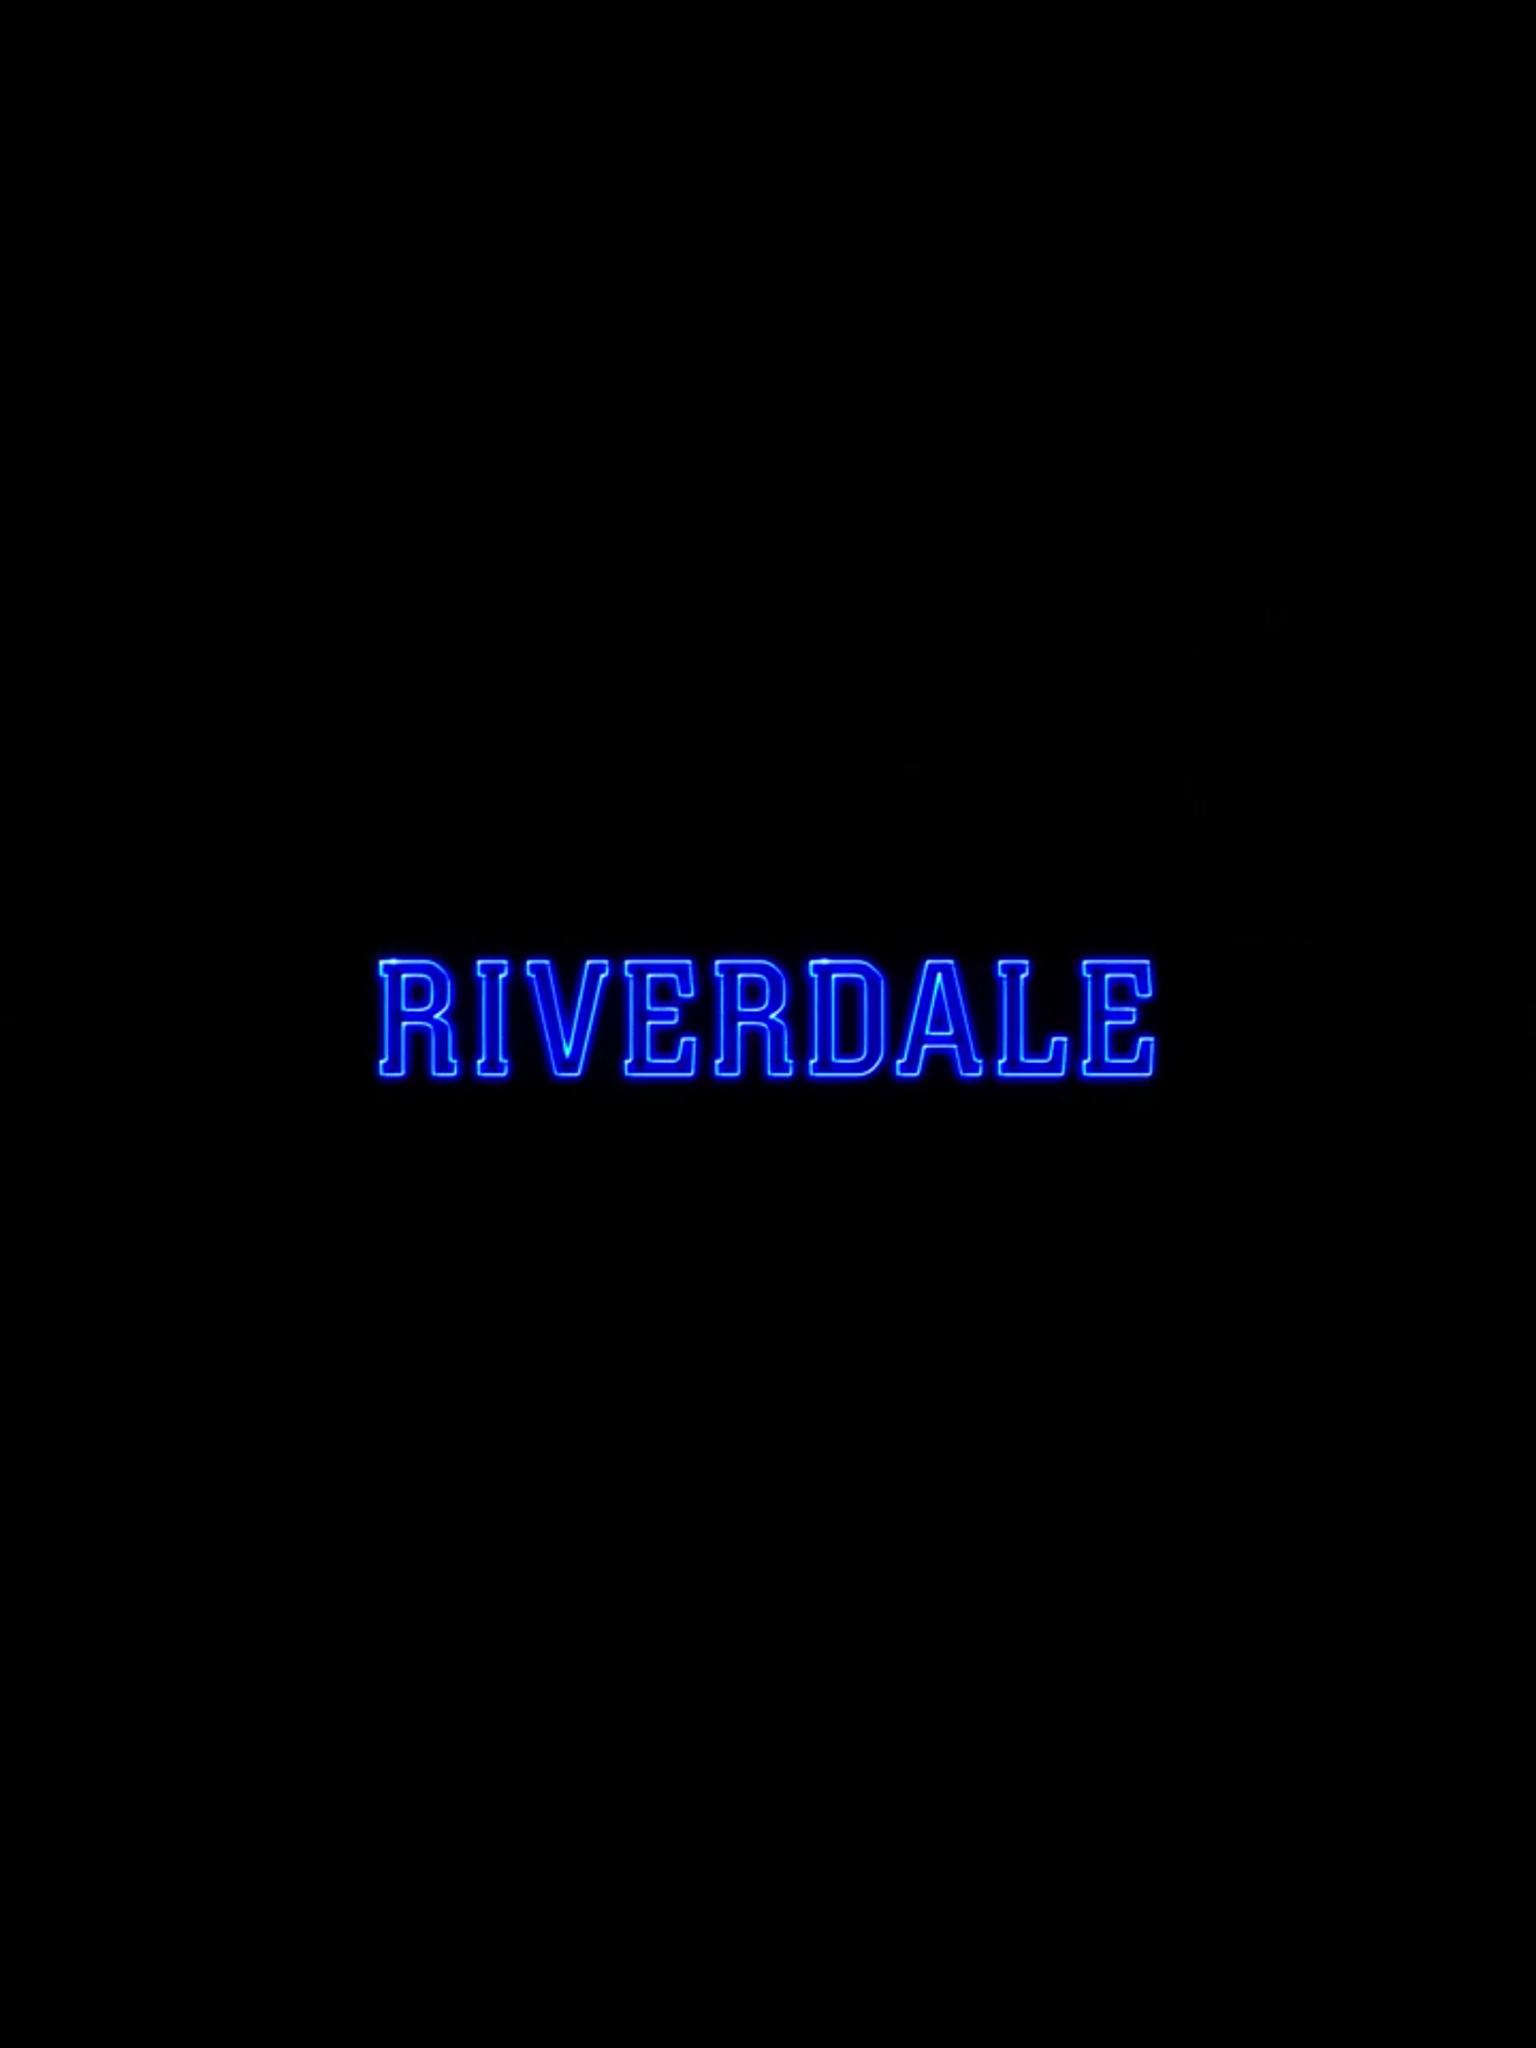 Pin By A On Riverdale Actores Imagenes Fondos De Pantalla Riverdale Riverdale Wallpaper Iphone Wallpaper Quotes